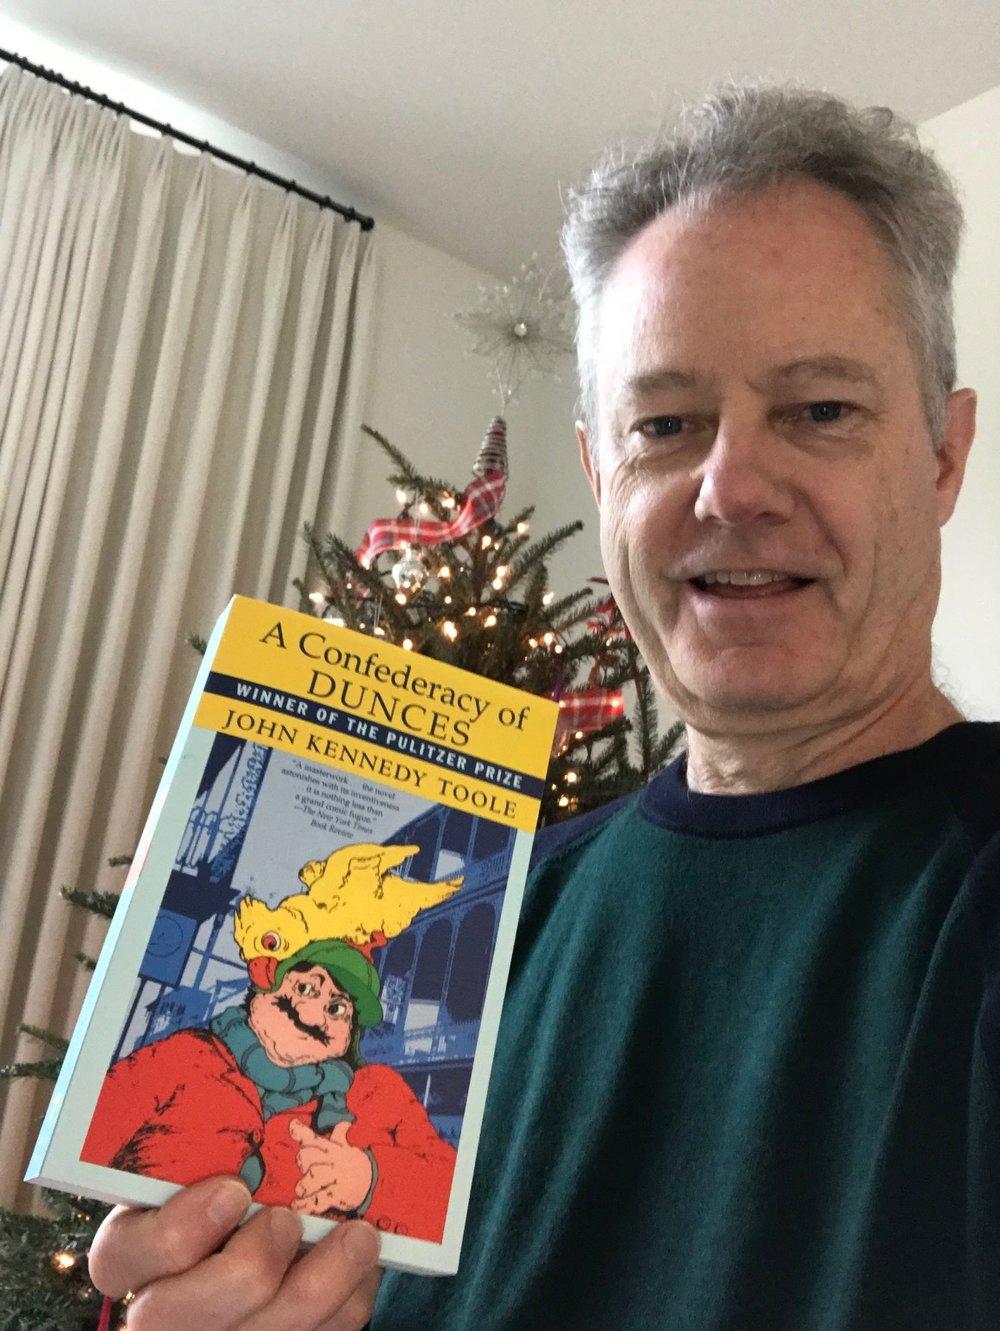 I put the novel on my Christmas list.